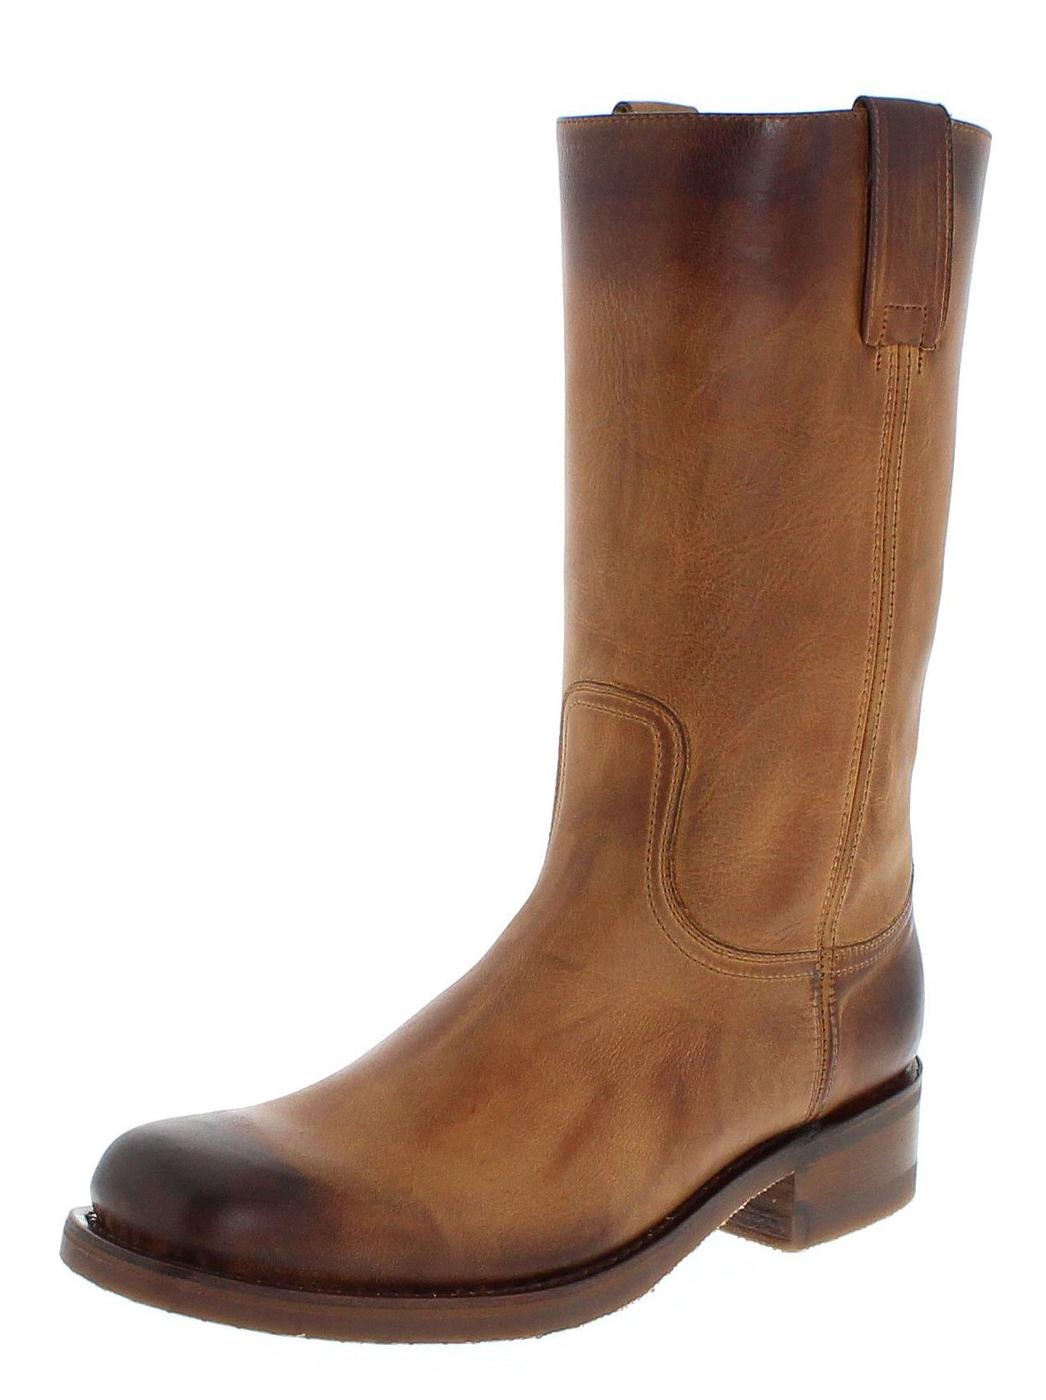 Sendra Boots 3162 Loren Teak Farm & Ranch Stiefel - braun